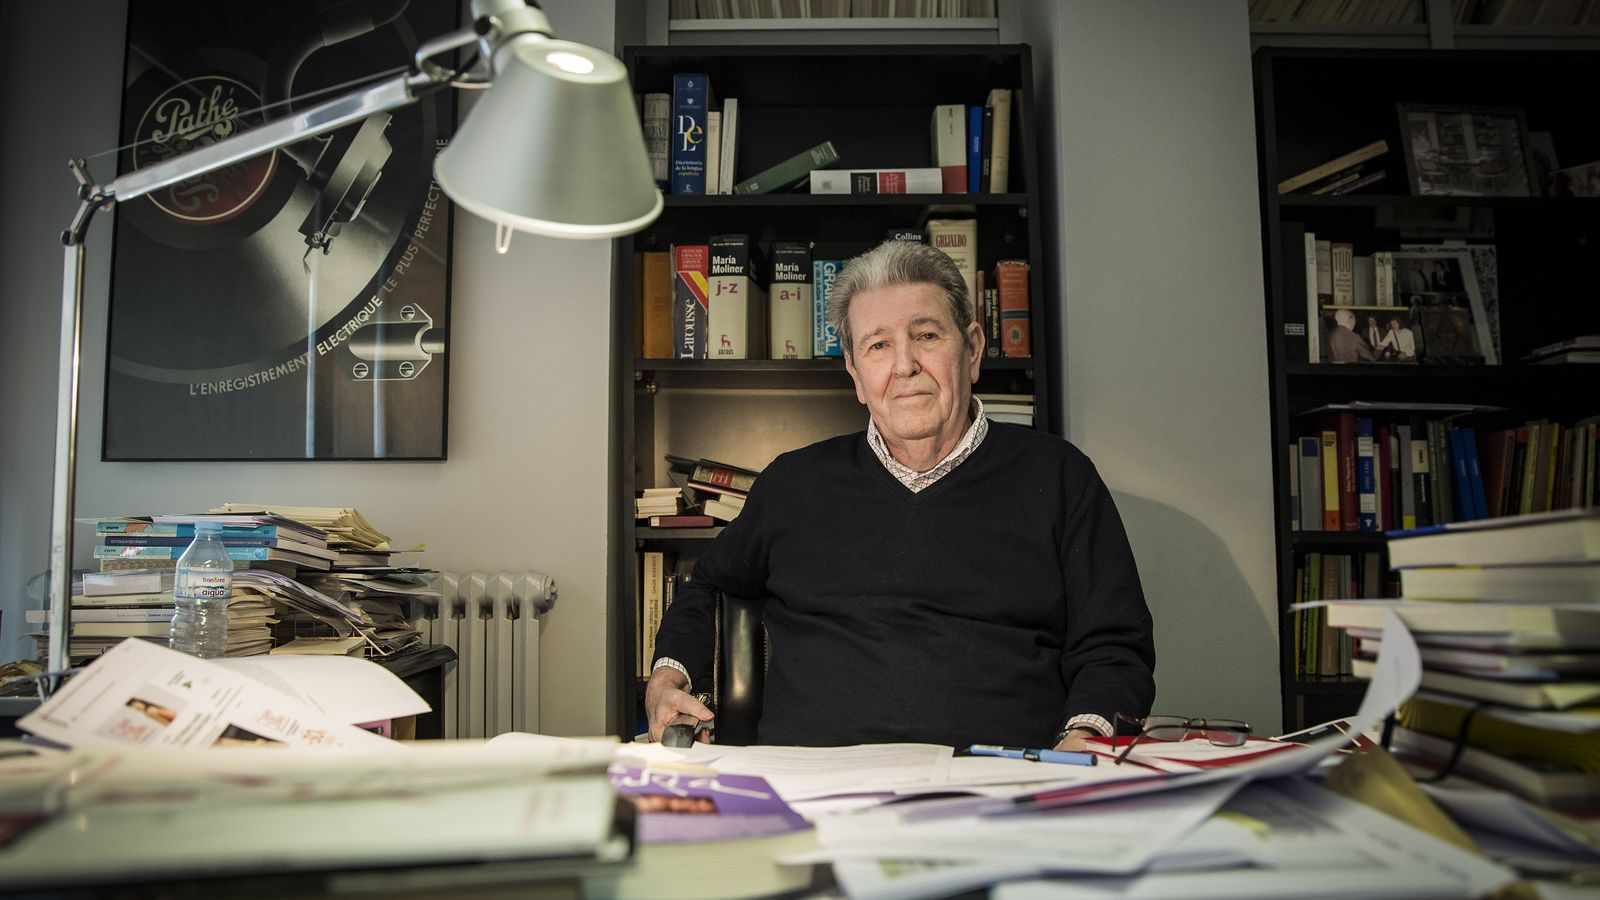 Entrevista a l'editor d'Anagrama, Jorge Herralde